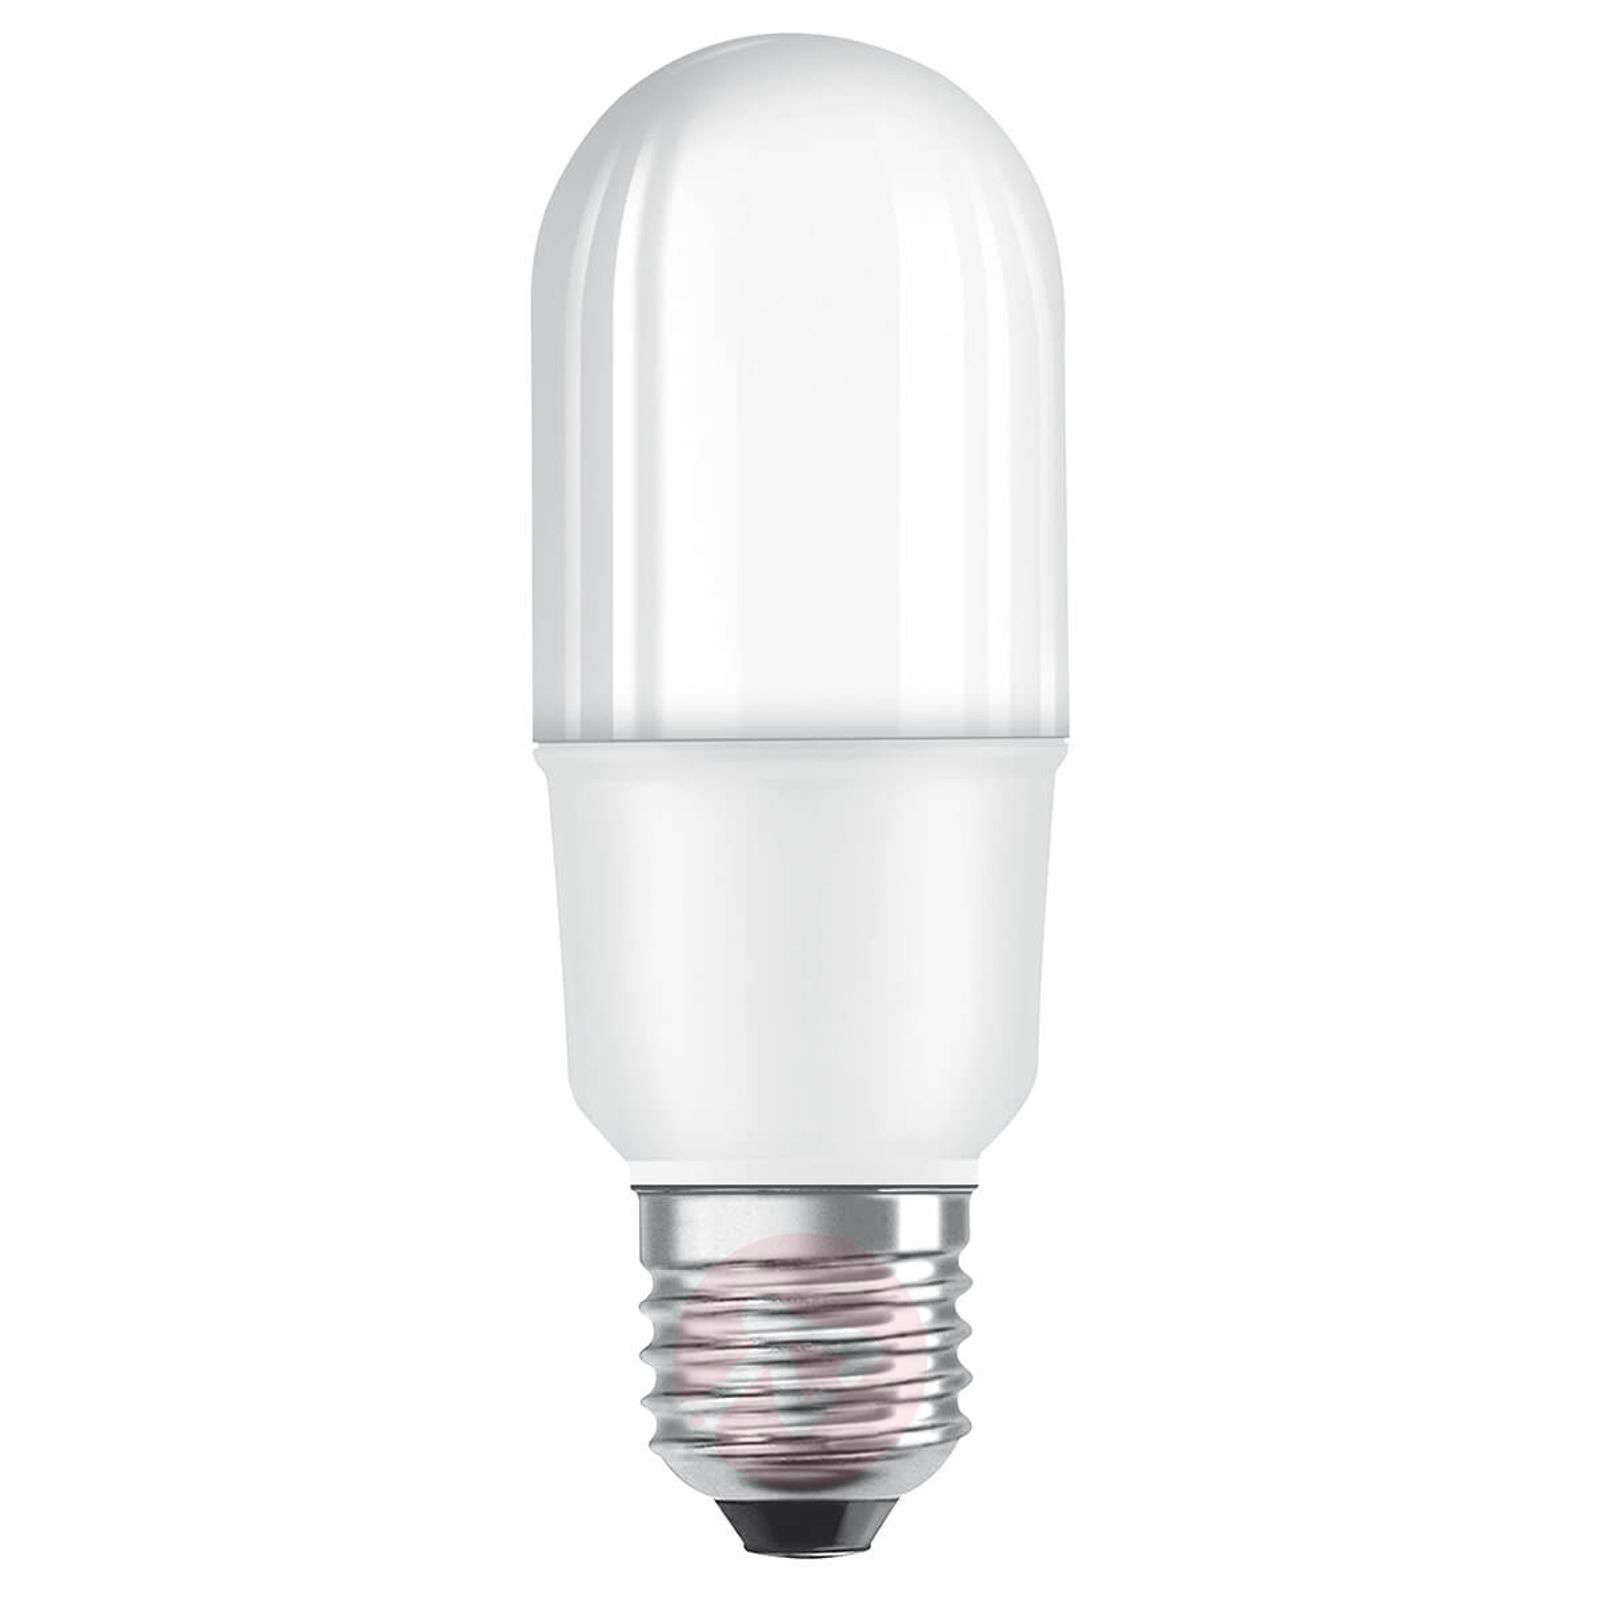 LED-putkilamppu E27 8 W-7262048X-01